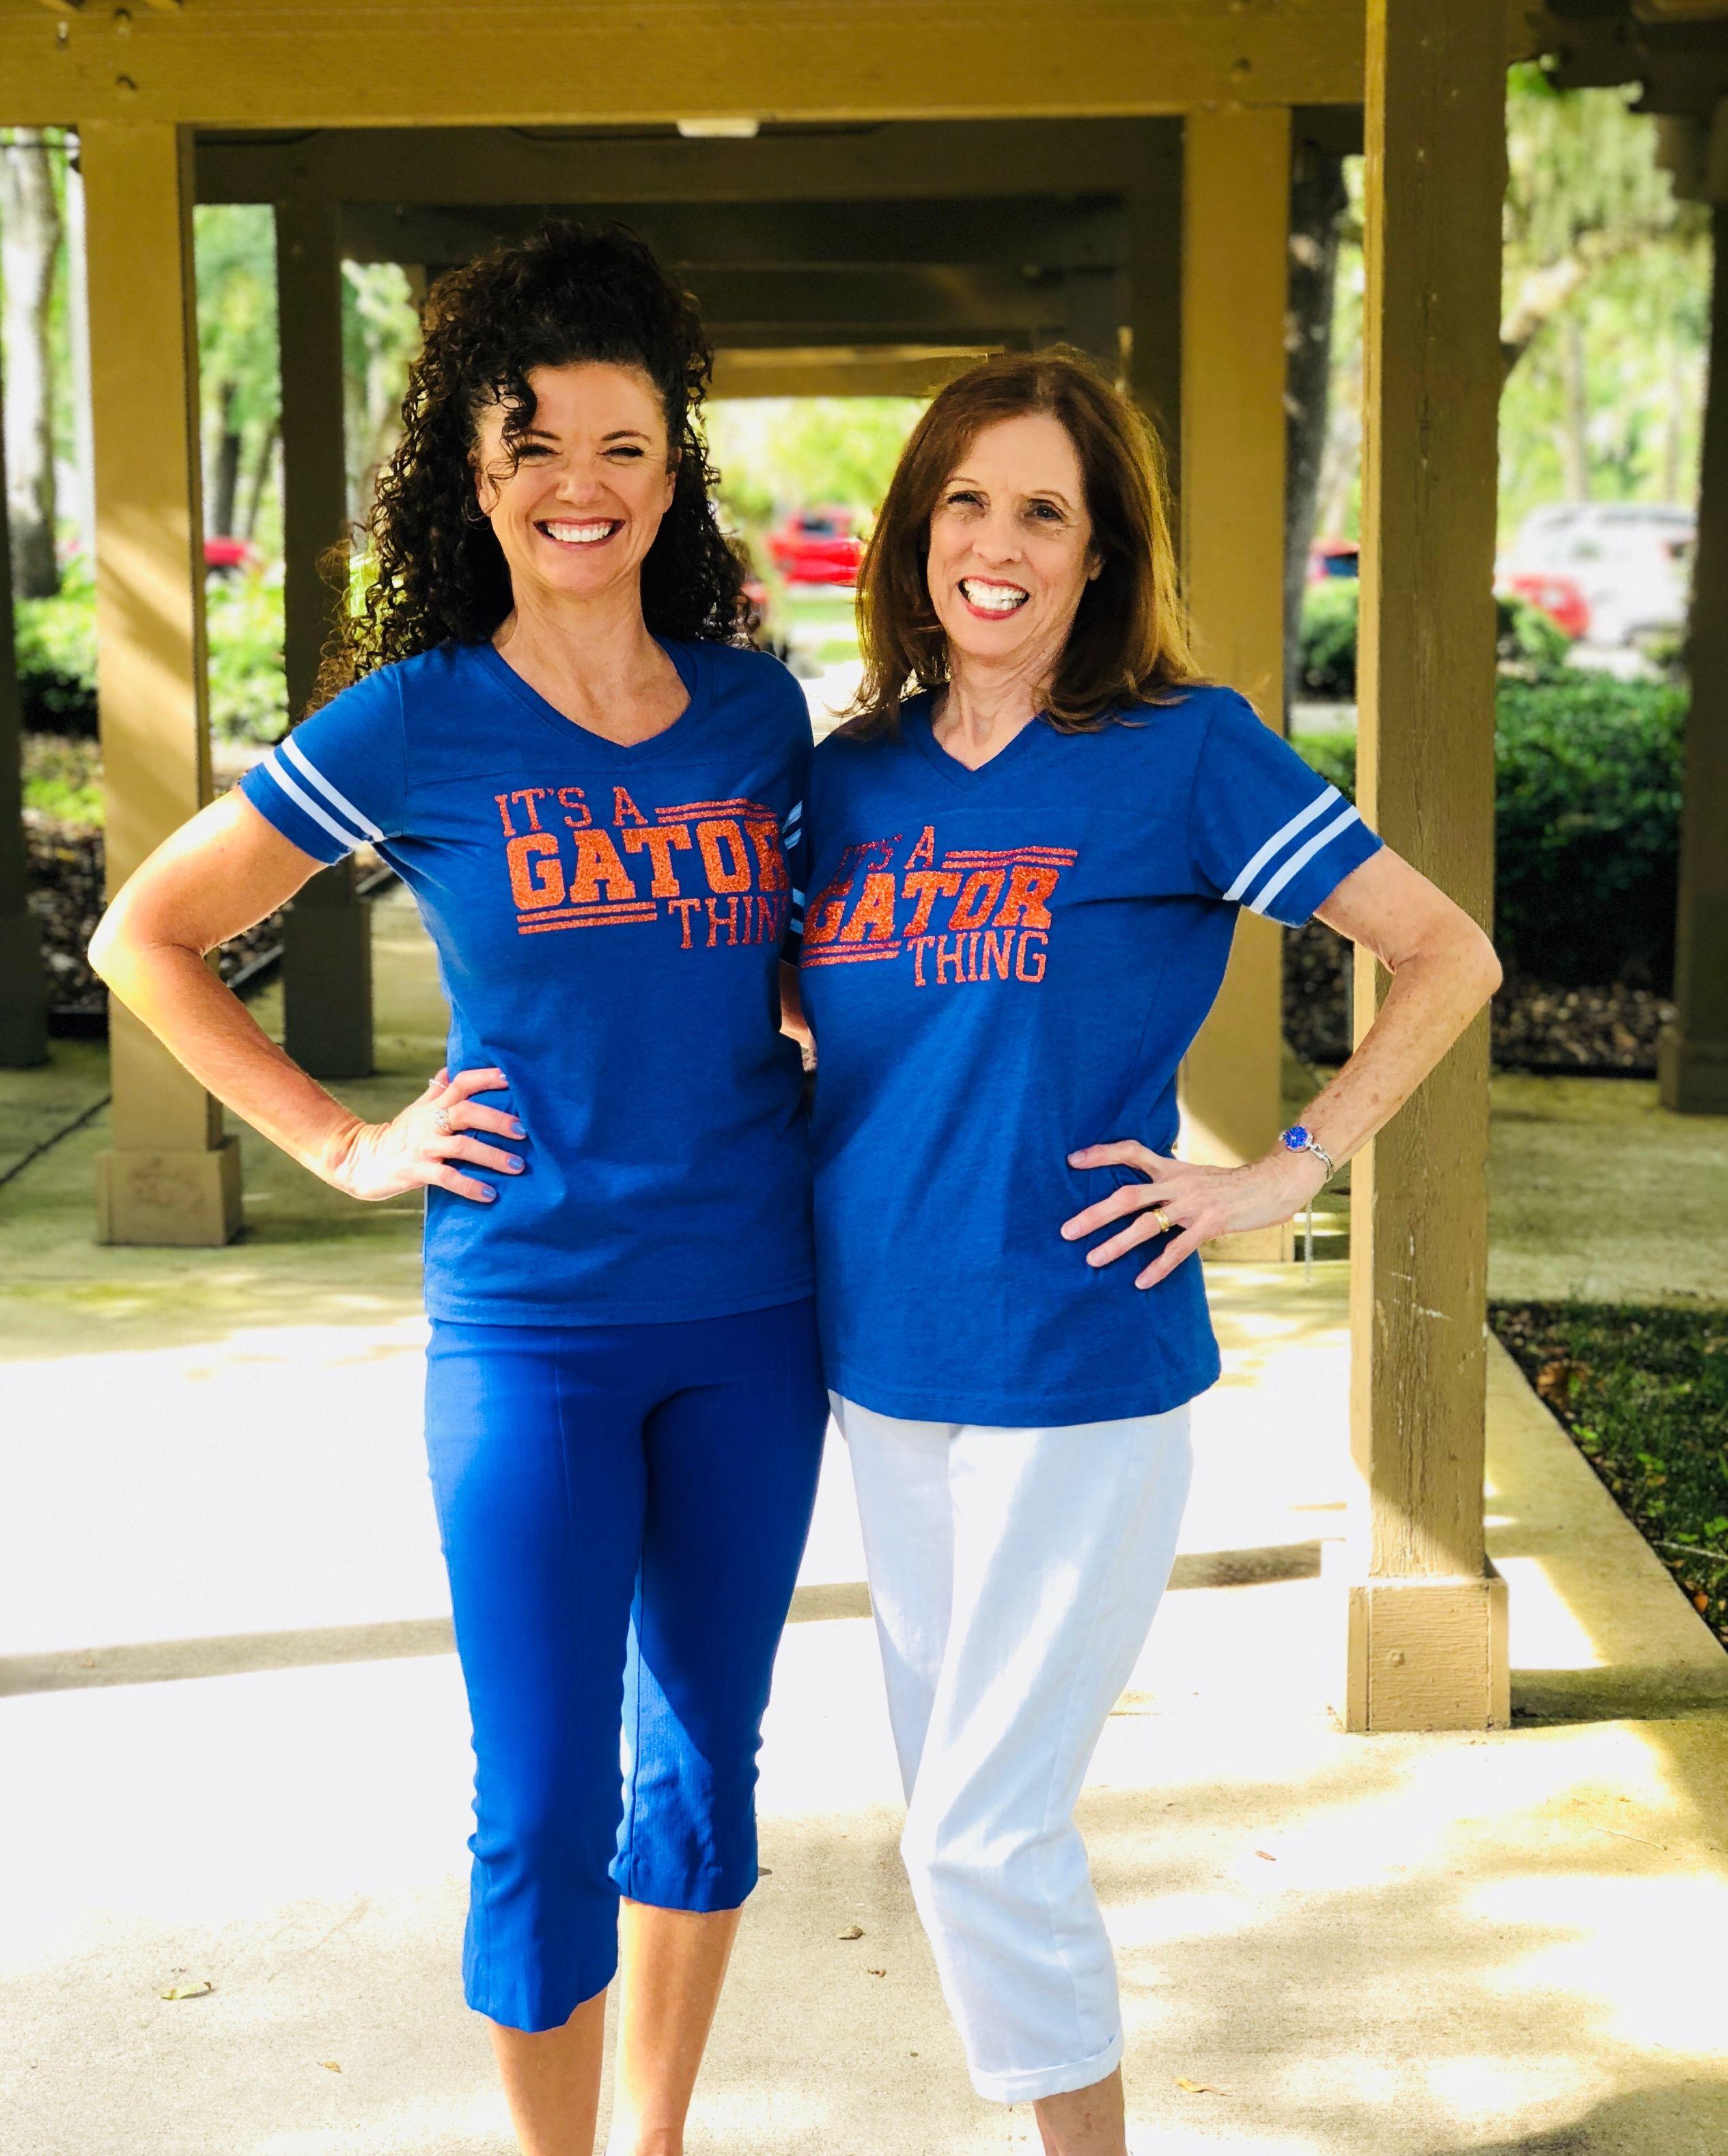 Pin by ILENES GATOR STORE on Florida Gators Tops Women